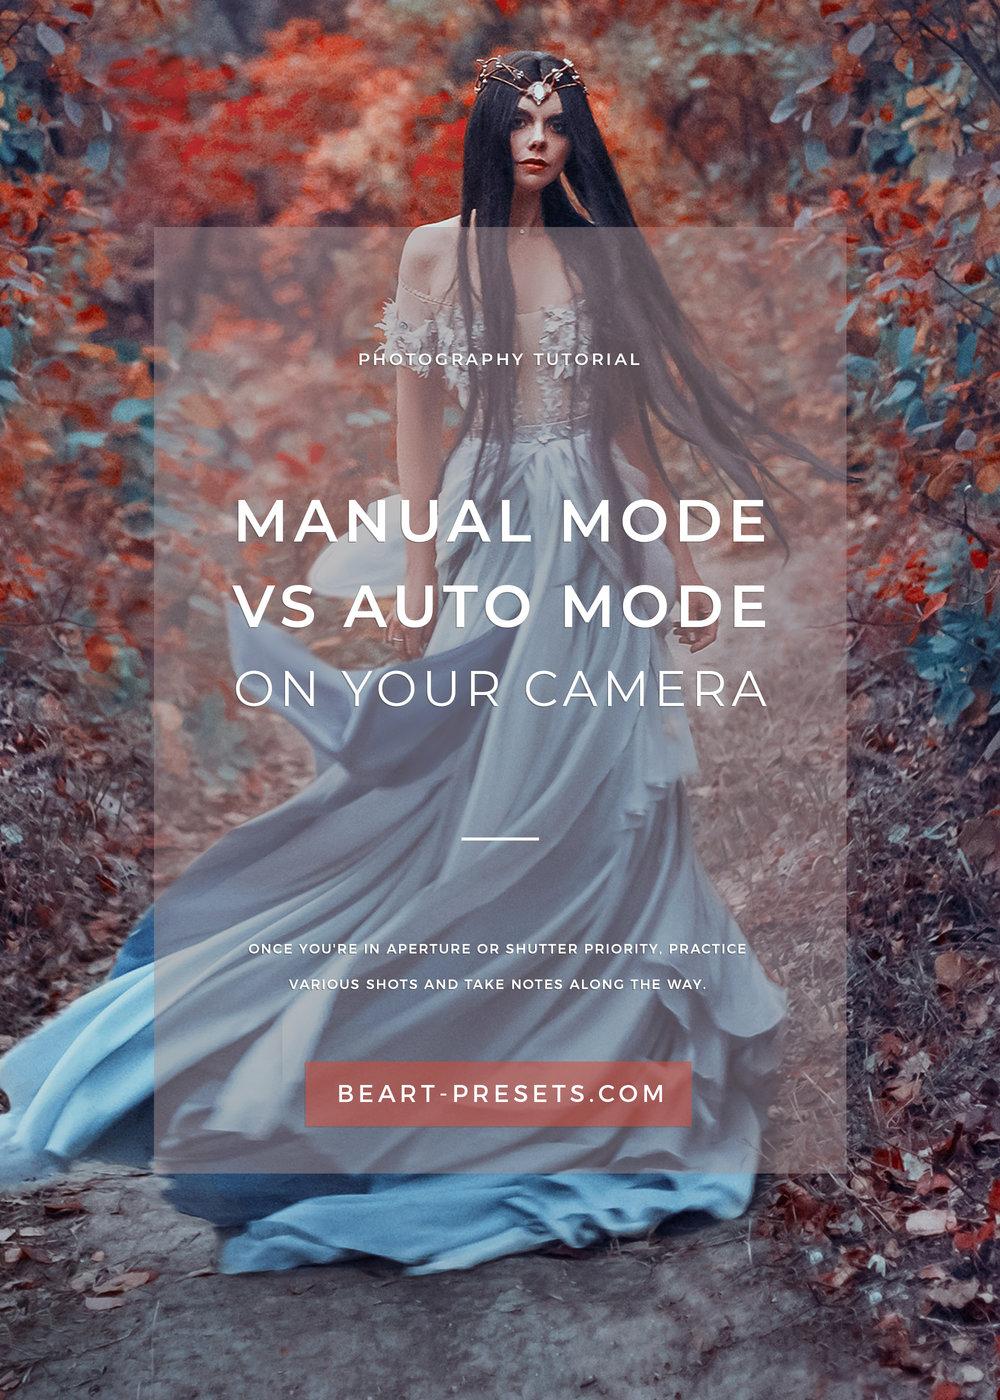 manual mode versus auto mode